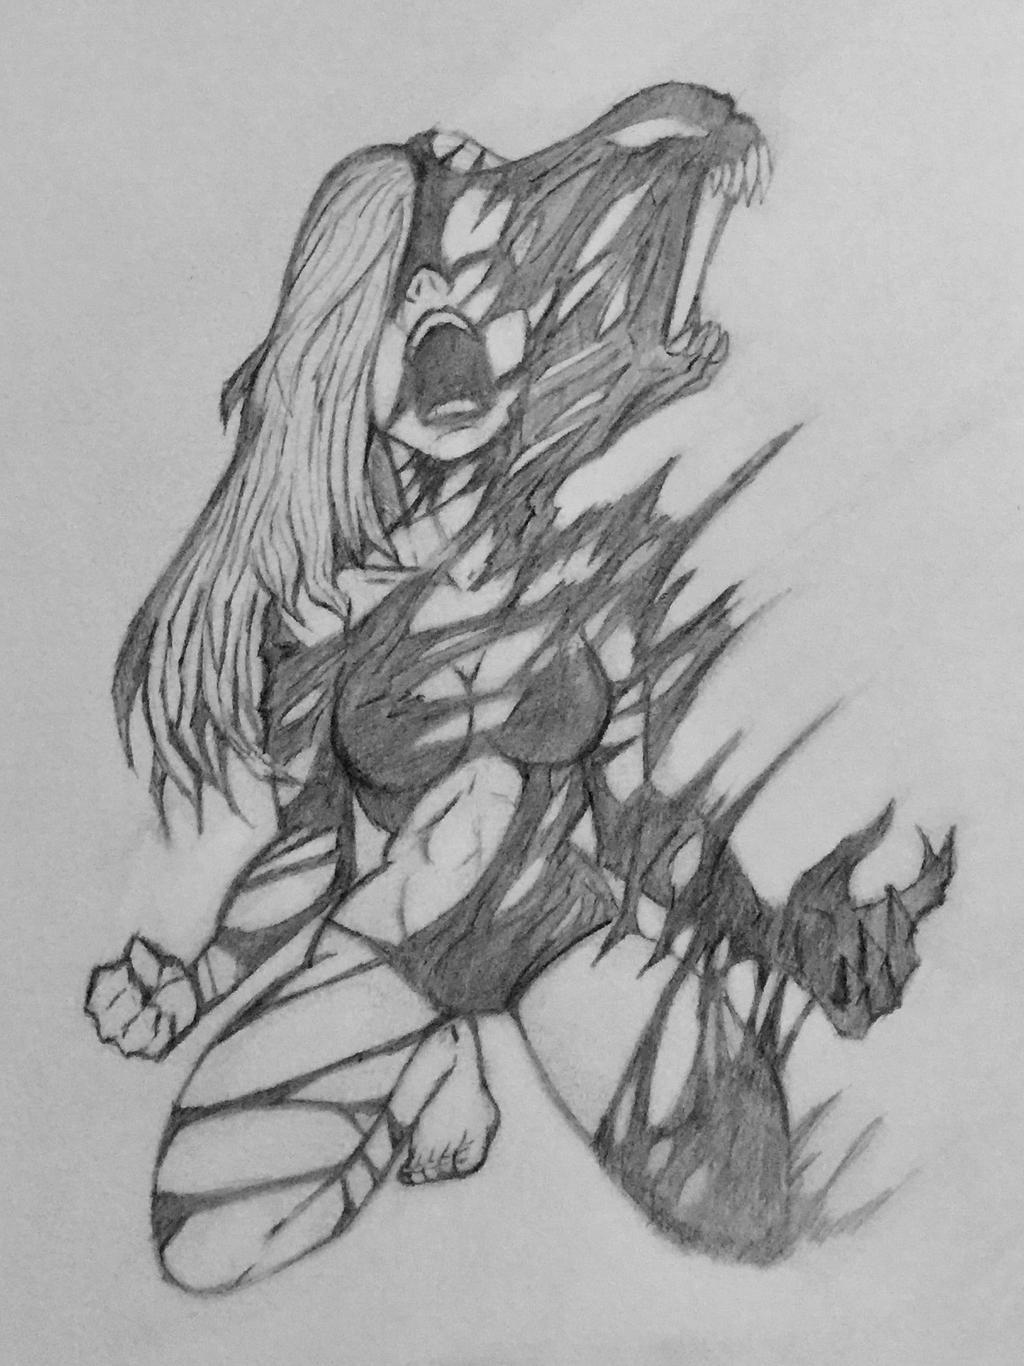 Spider woman 4 by diabolik0